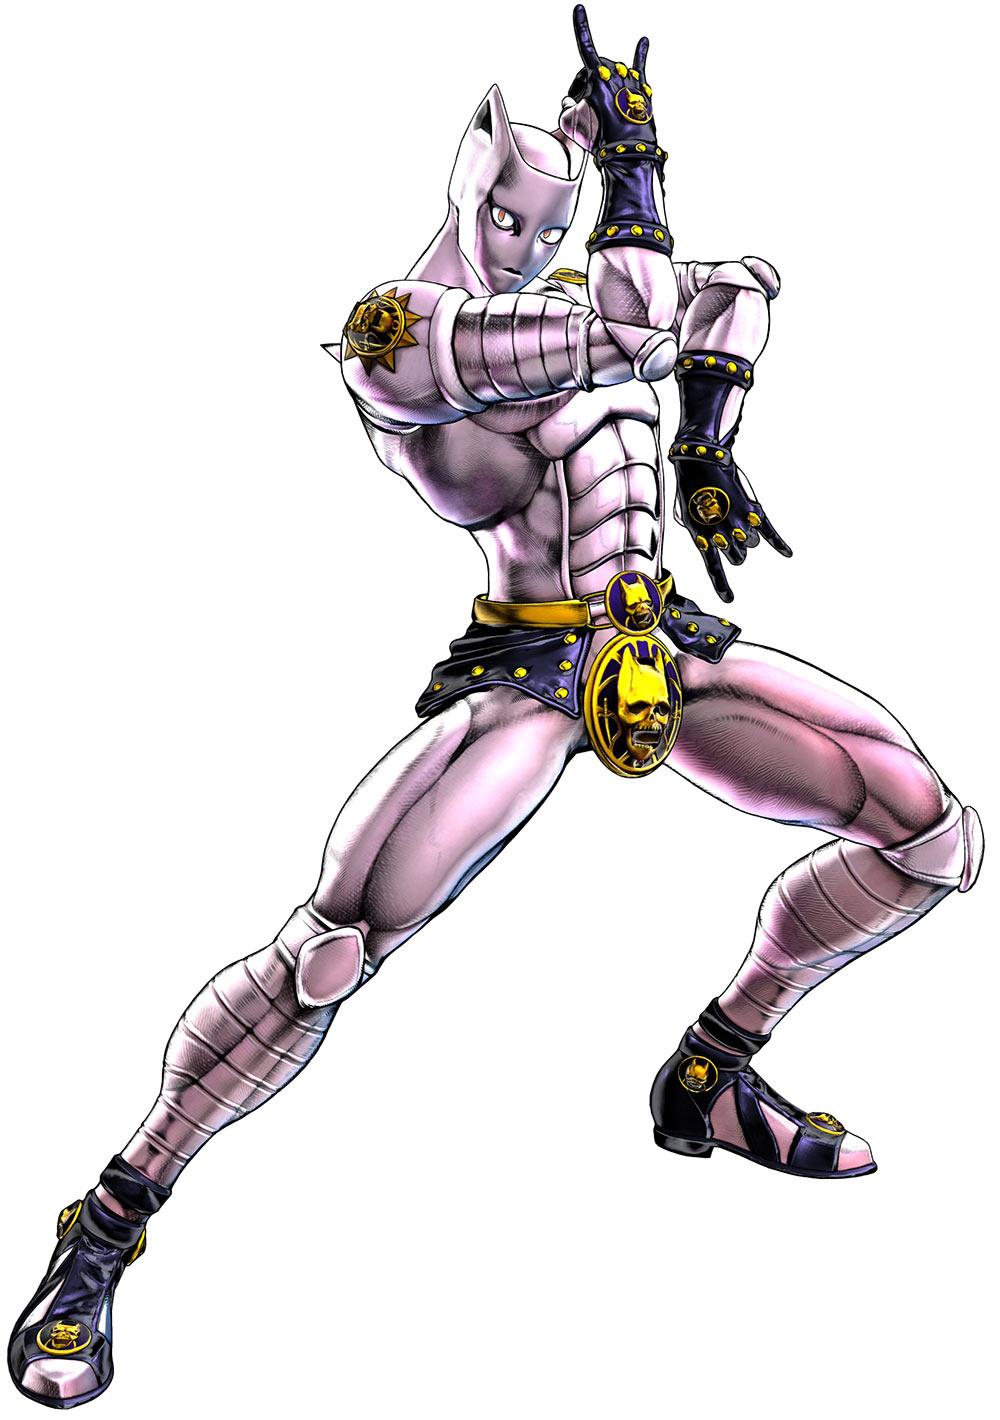 Jojo's Bizarre Adventure: All-Star Battle - Official Character Artwork